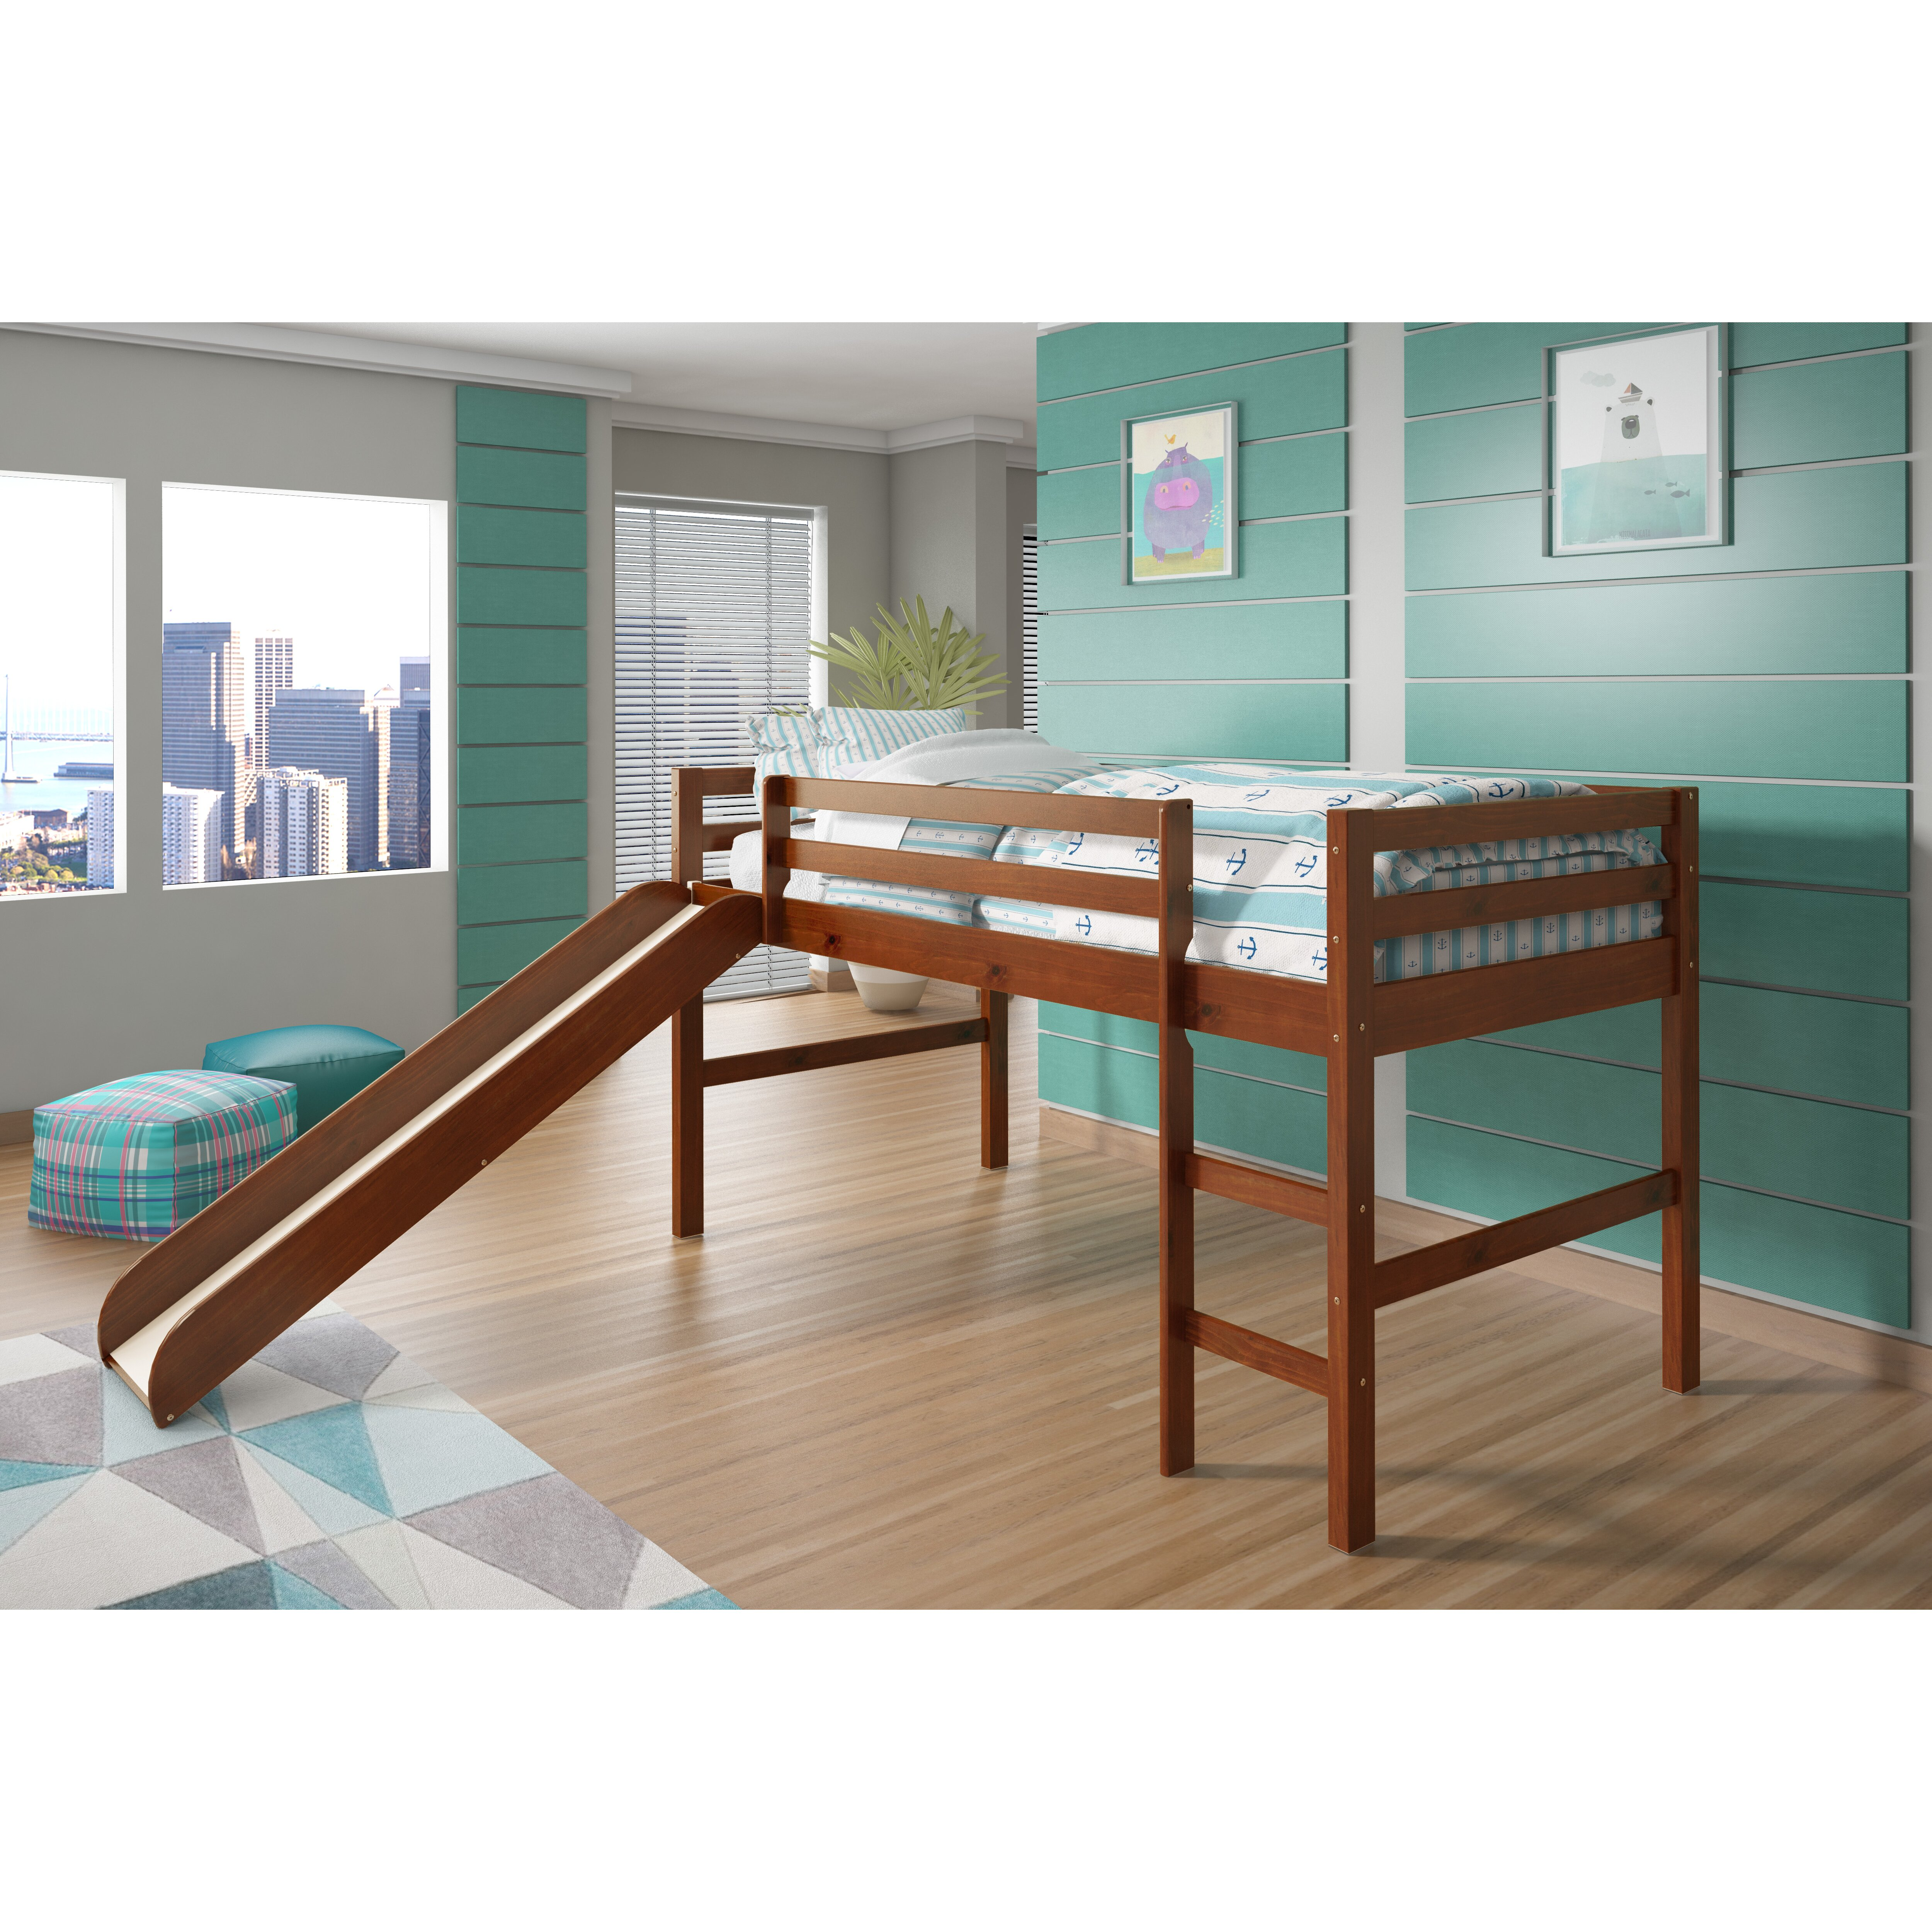 donco kids twin low loft bed reviews wayfair. Black Bedroom Furniture Sets. Home Design Ideas